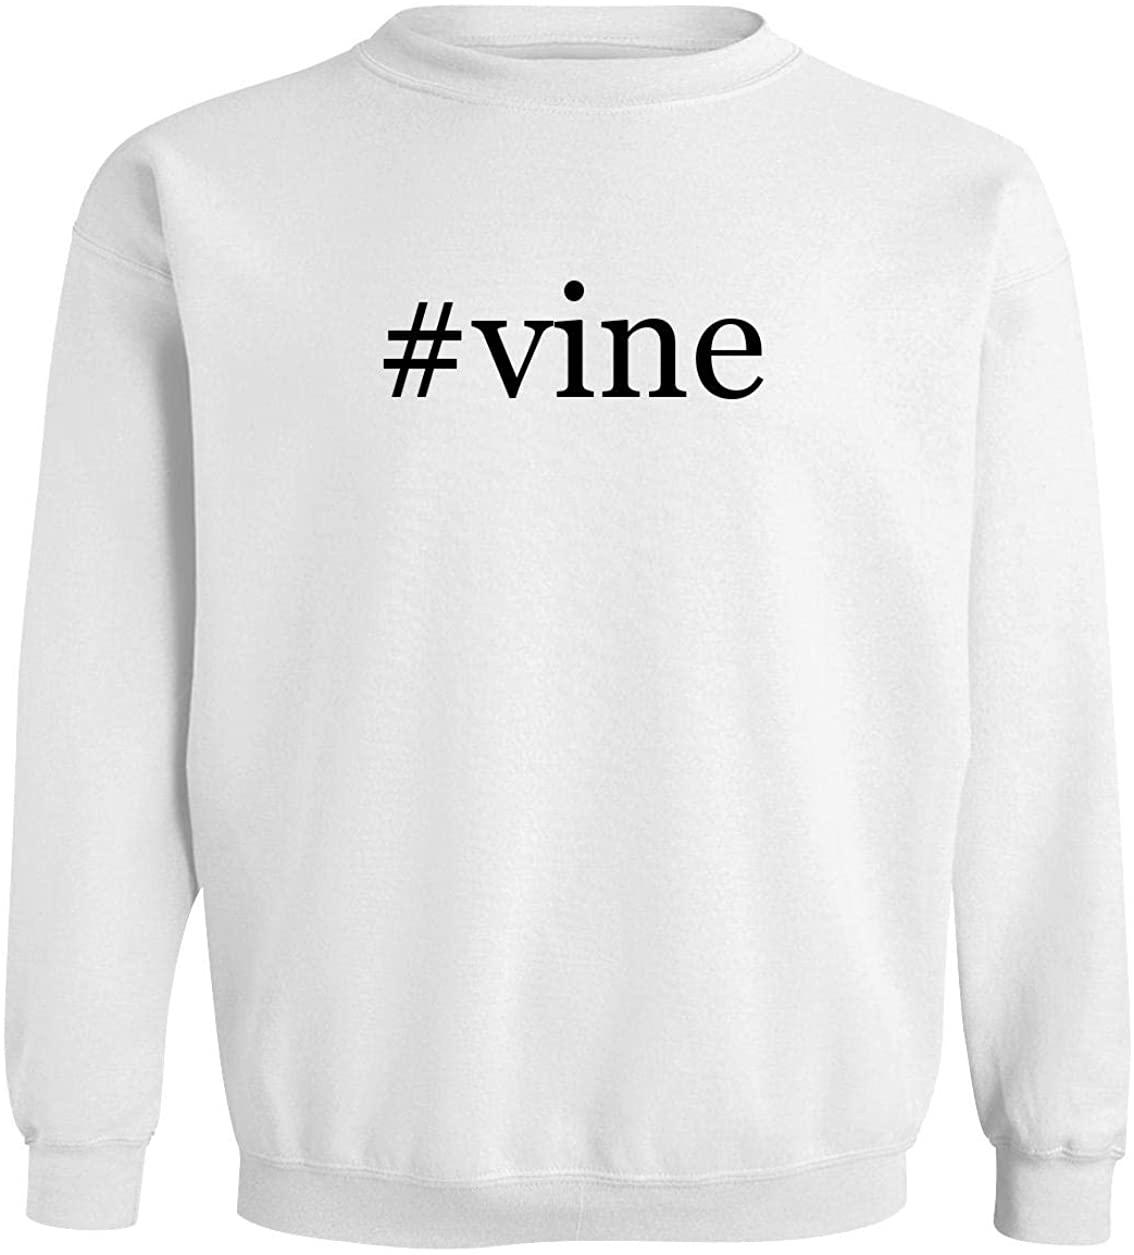 #vine - Men's Soft & Comfortable Long Sleeve T-Shirt